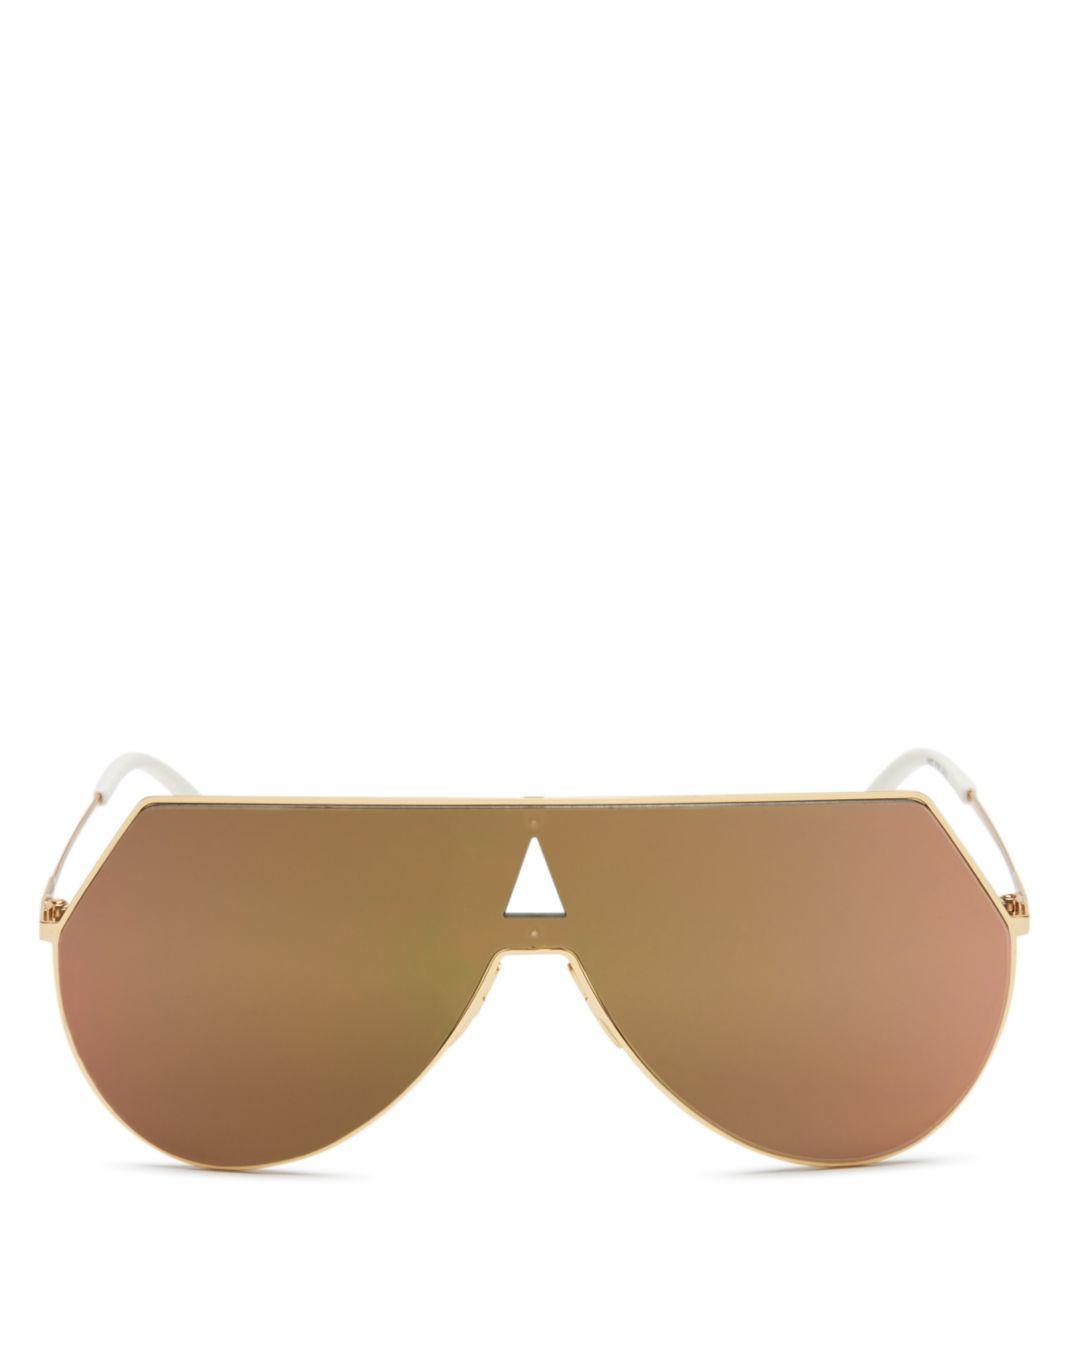 6c049f17e80a8 Fendi Women s Eyeline Mirrored Shield Sunglasses in Metallic - Lyst